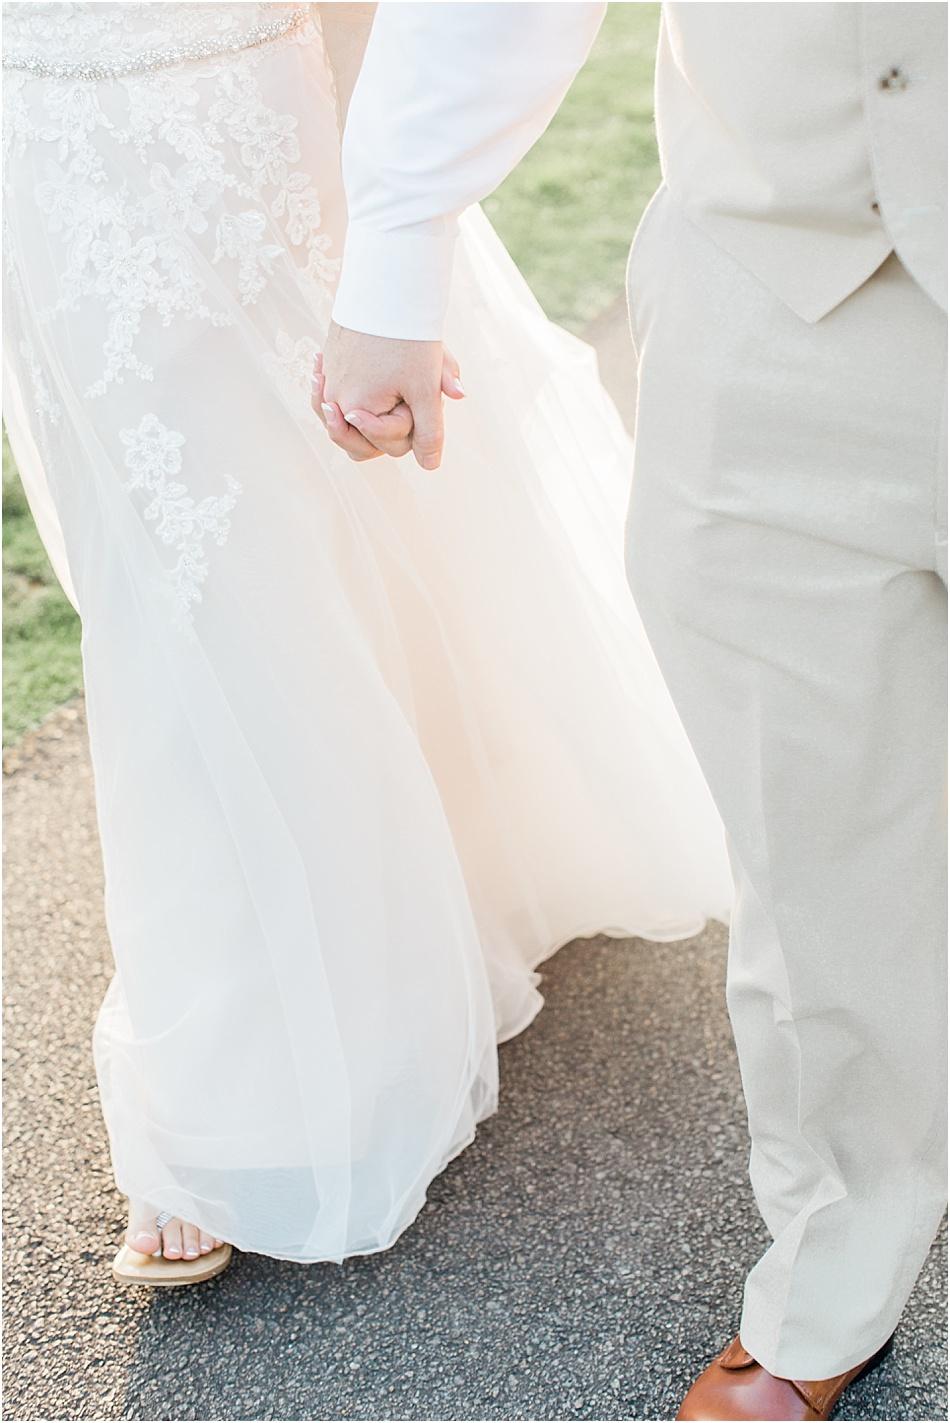 brookside_country_club_cape_cod_boston_wedding_photographer_Meredith_Jane_Photography_photo_0151.jpg